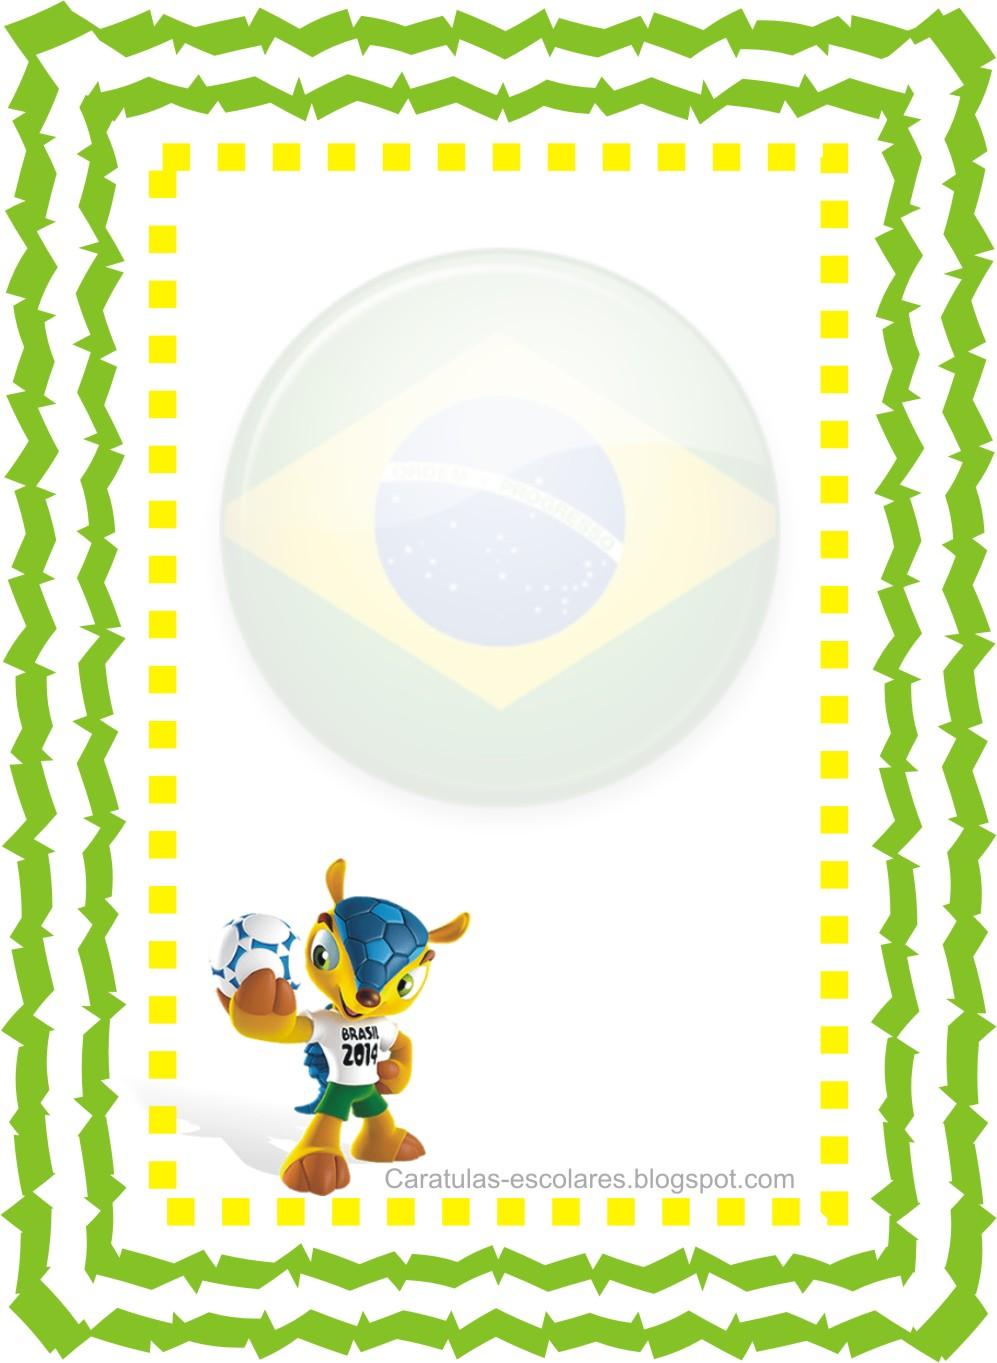 http://caratulas-escolares.blogspot.com/2014/05/fuleco-mascota-mundial